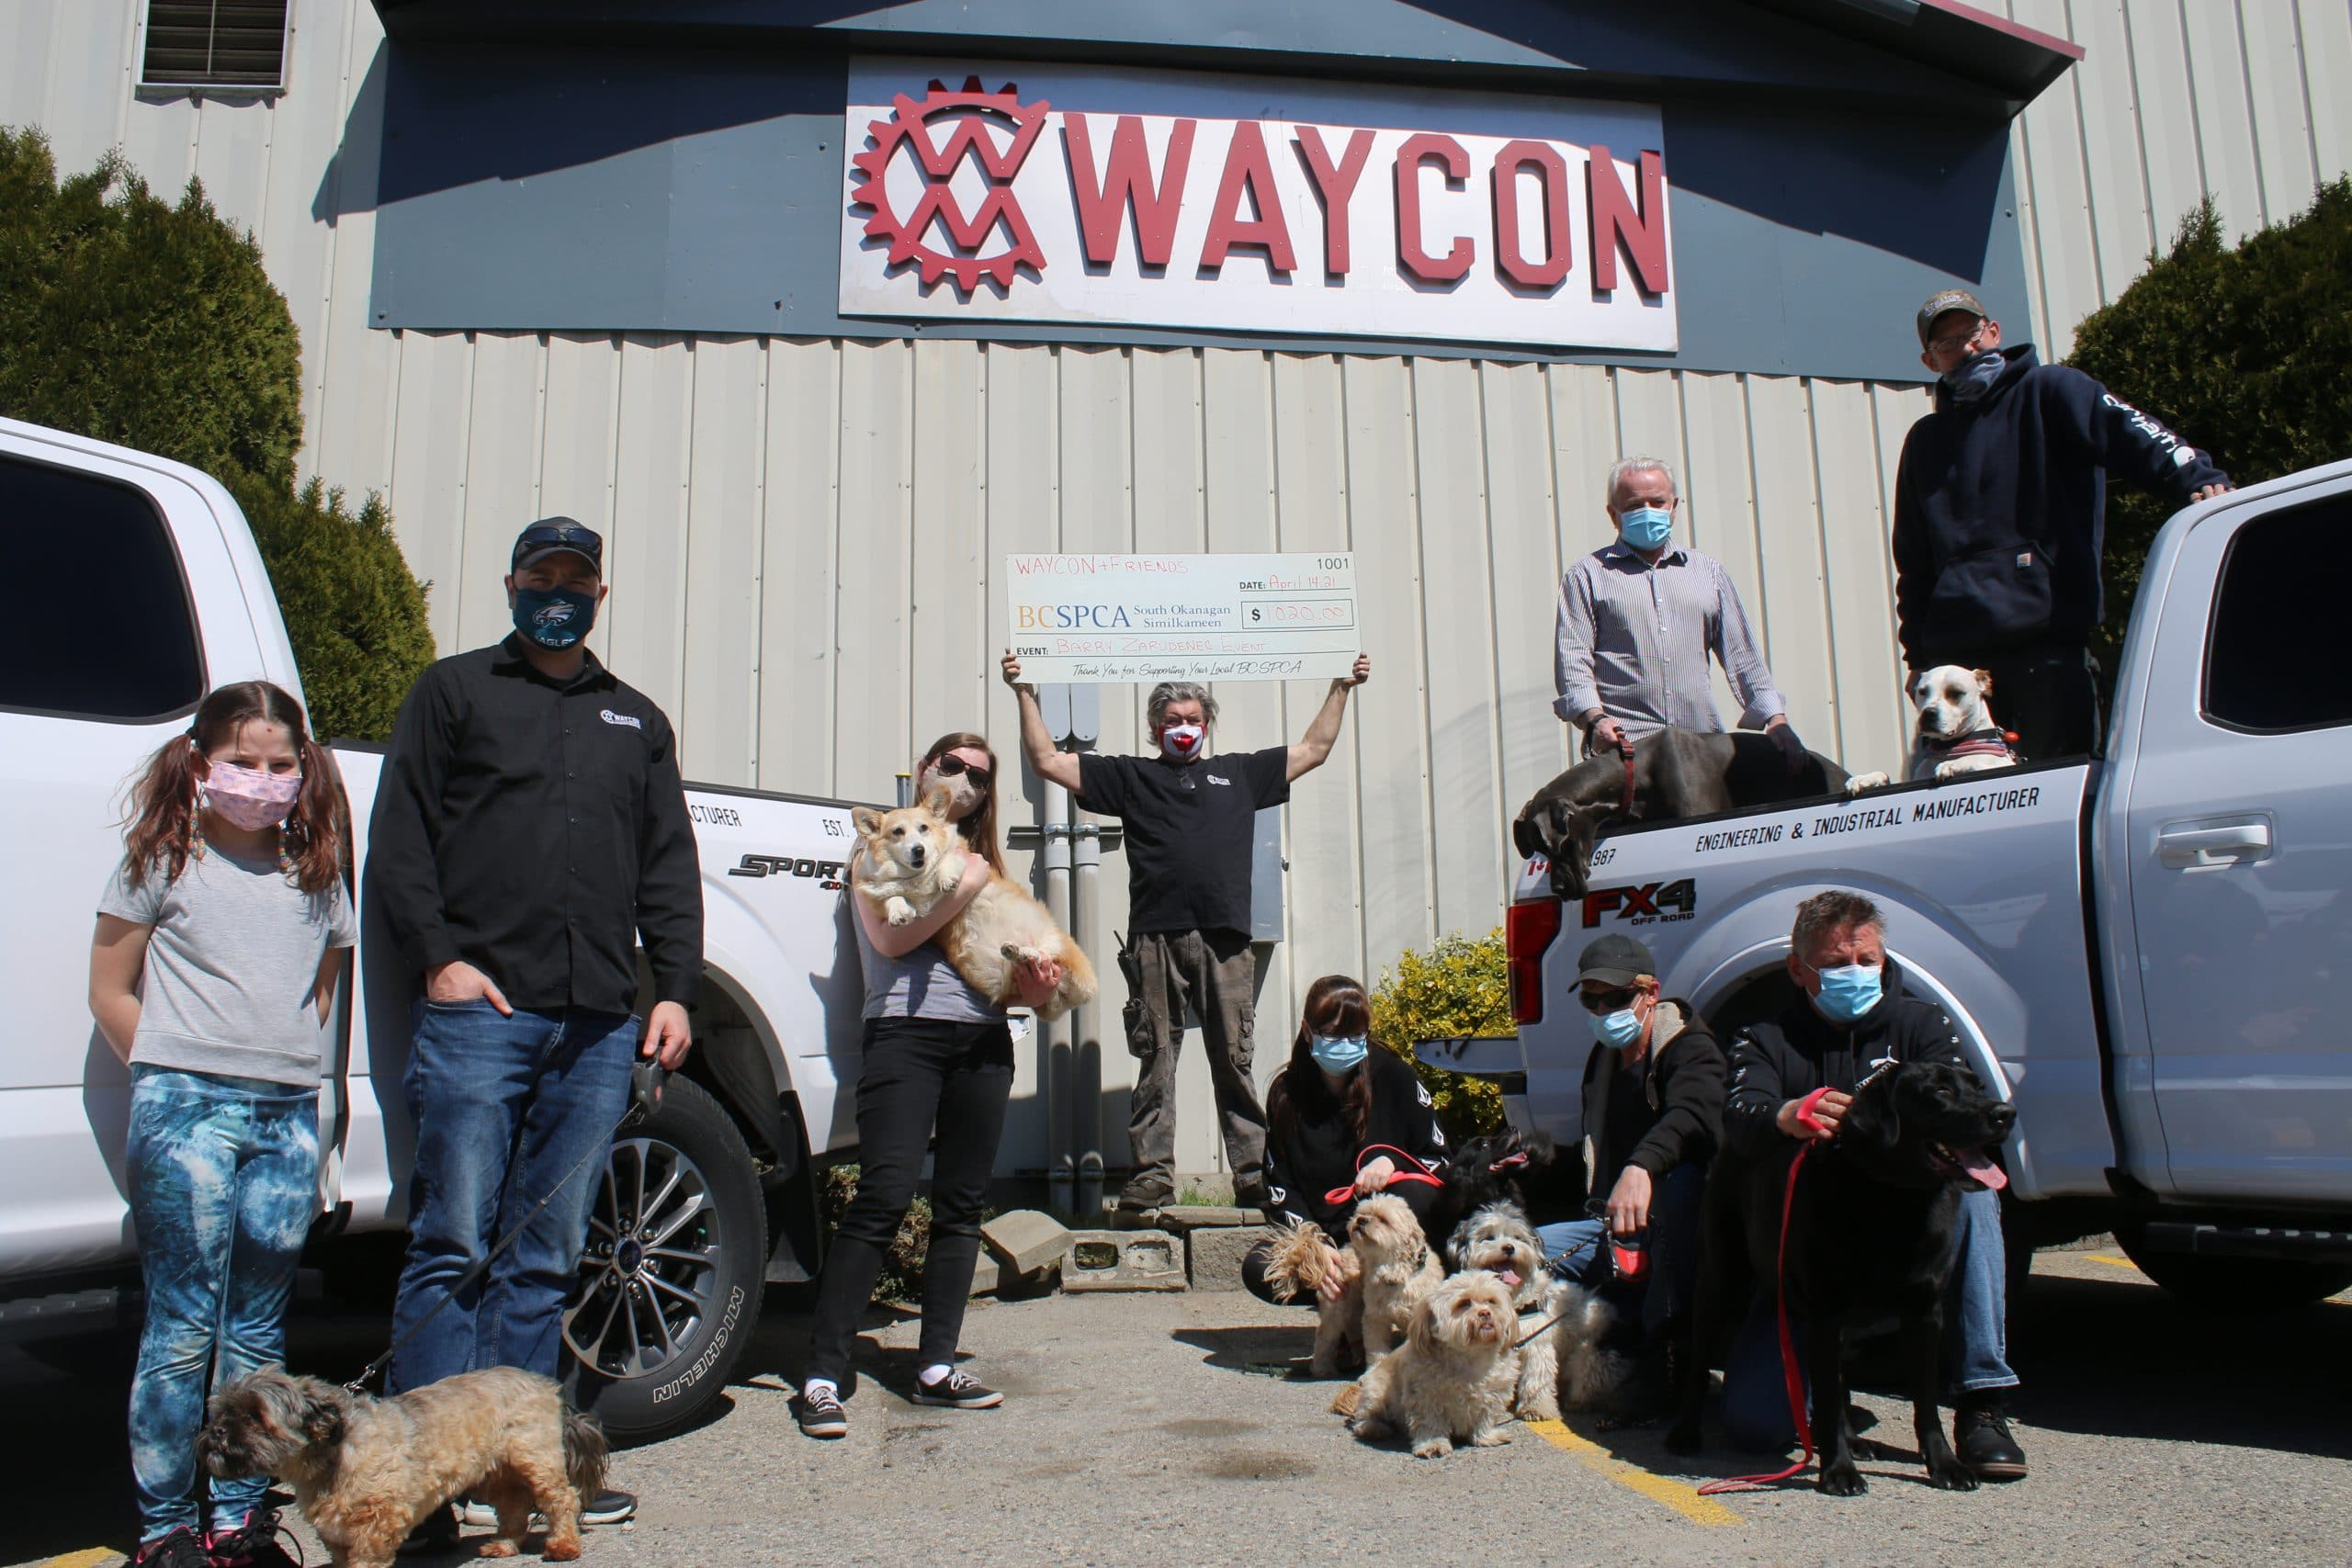 Waycon Manufacturing SPCA Fundraiser